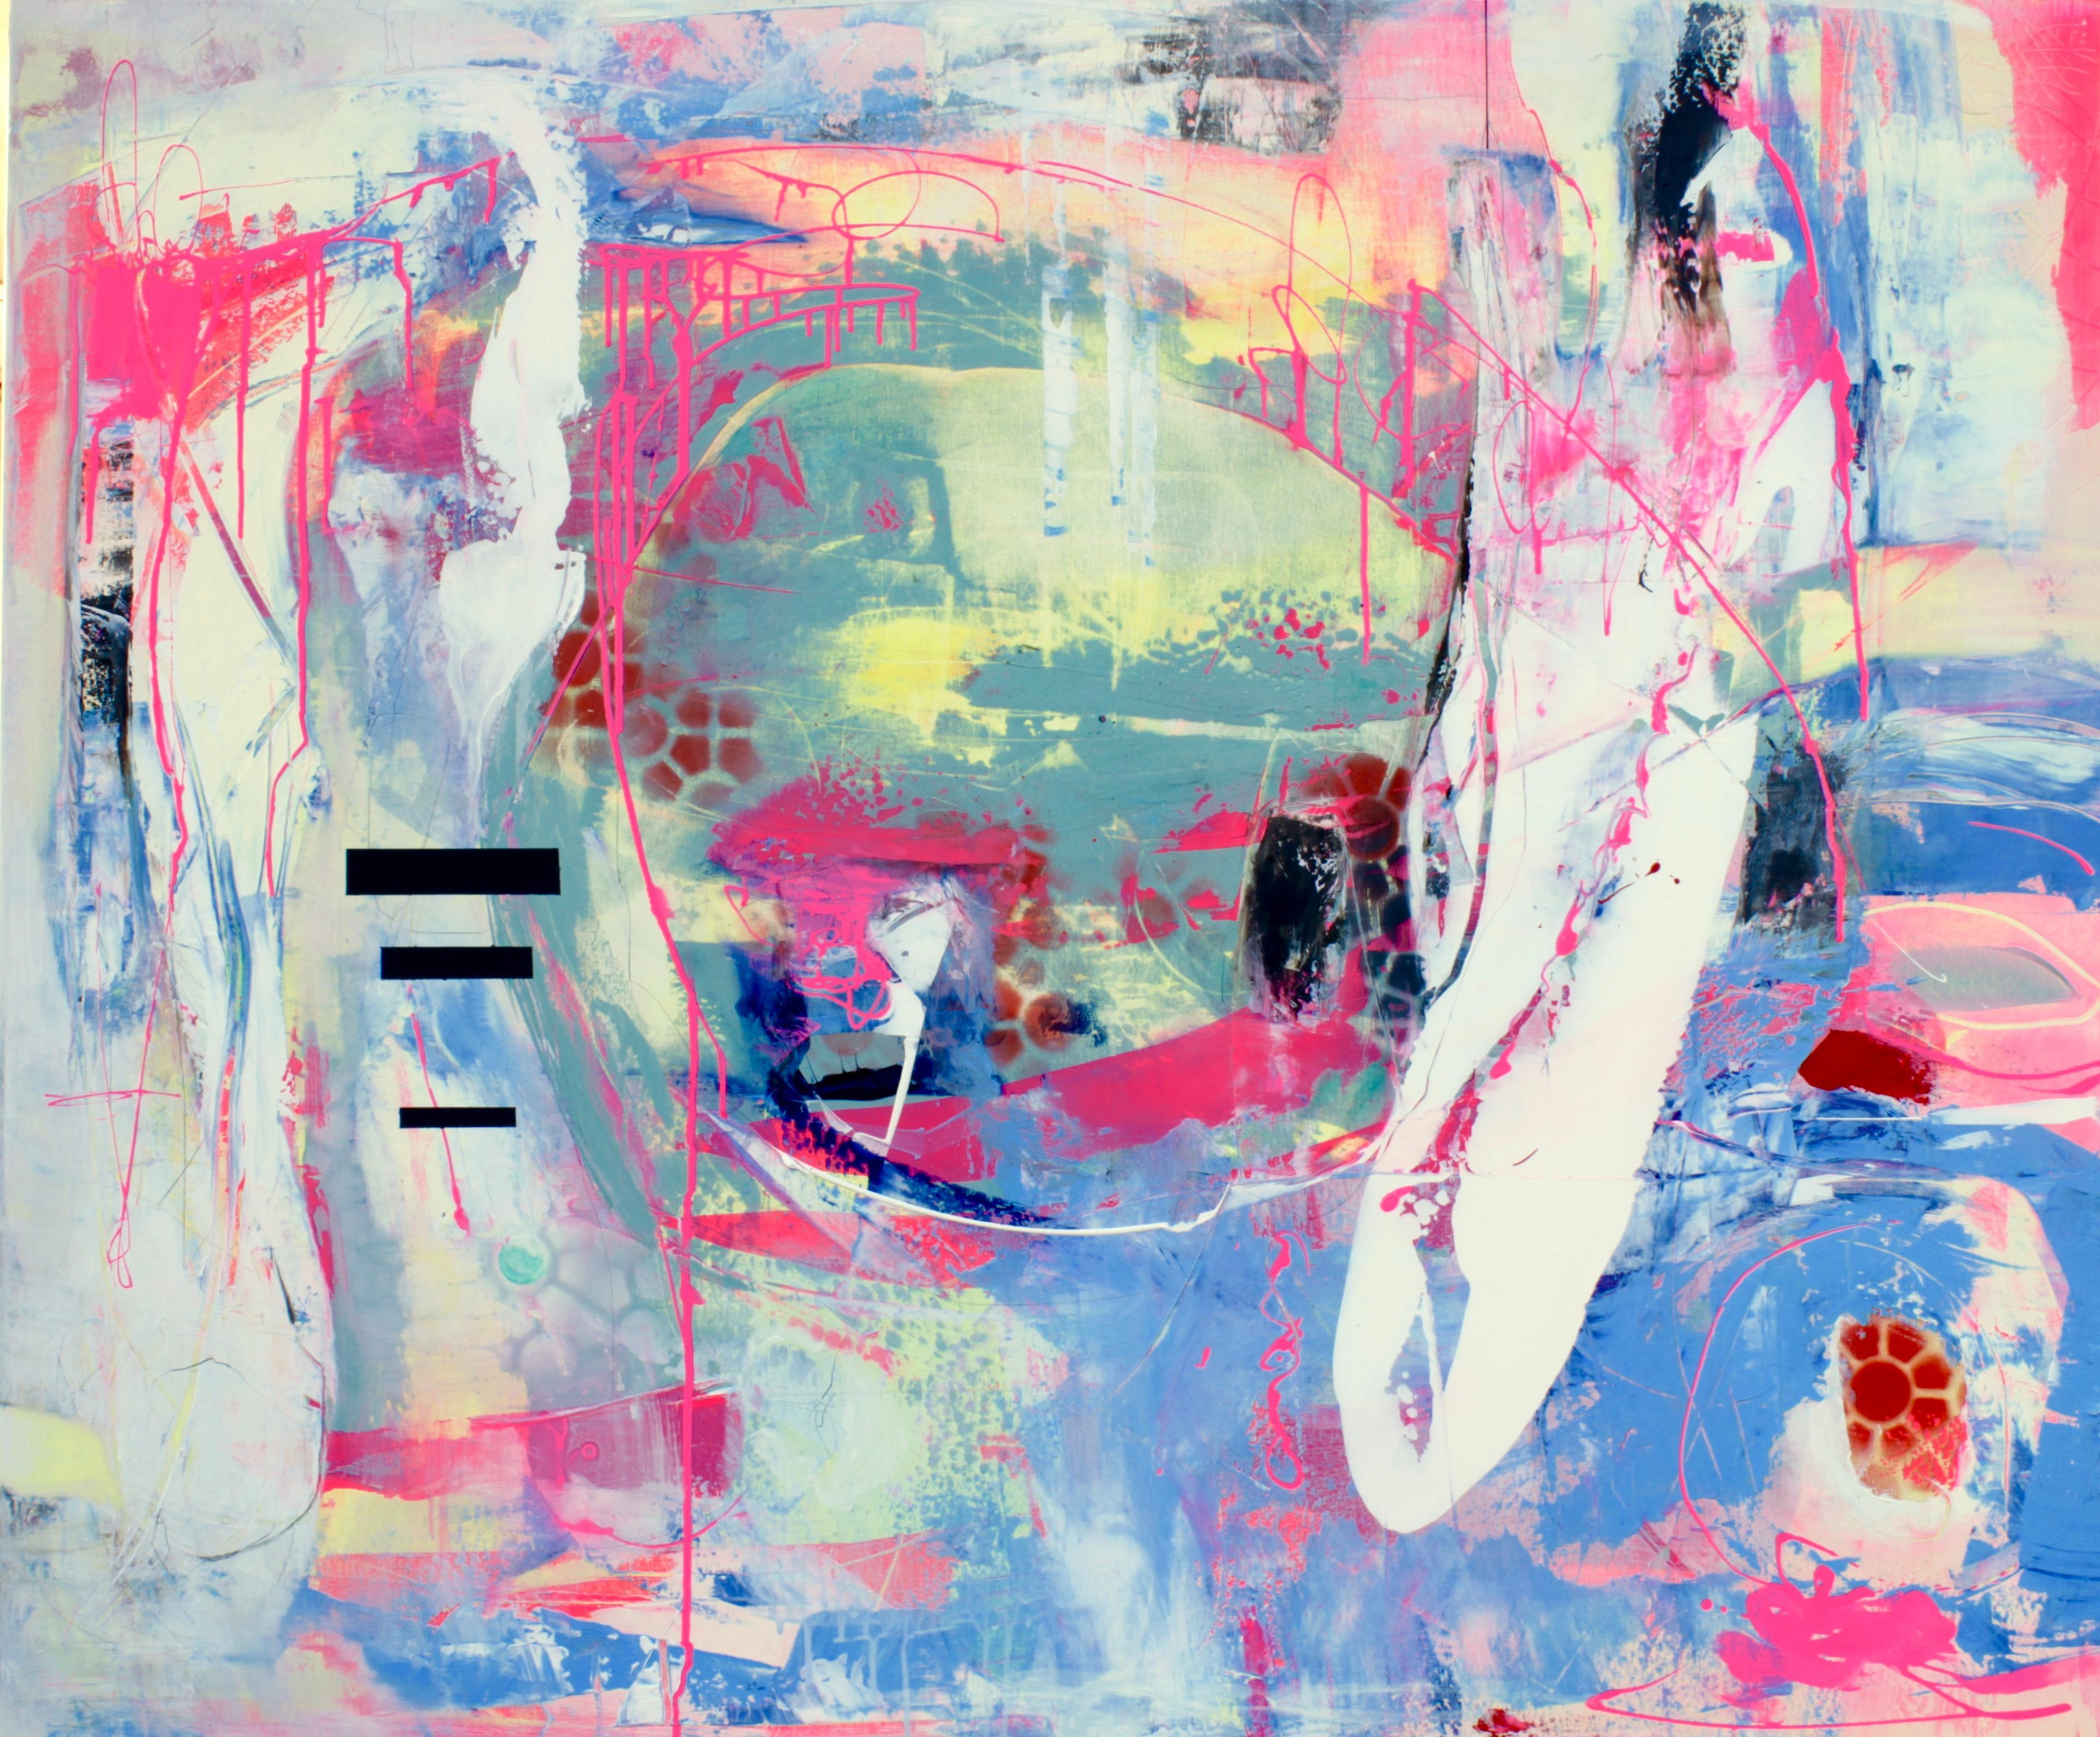 artwork BERLIN SYNERGIES V by Deniz Hasenöhrl